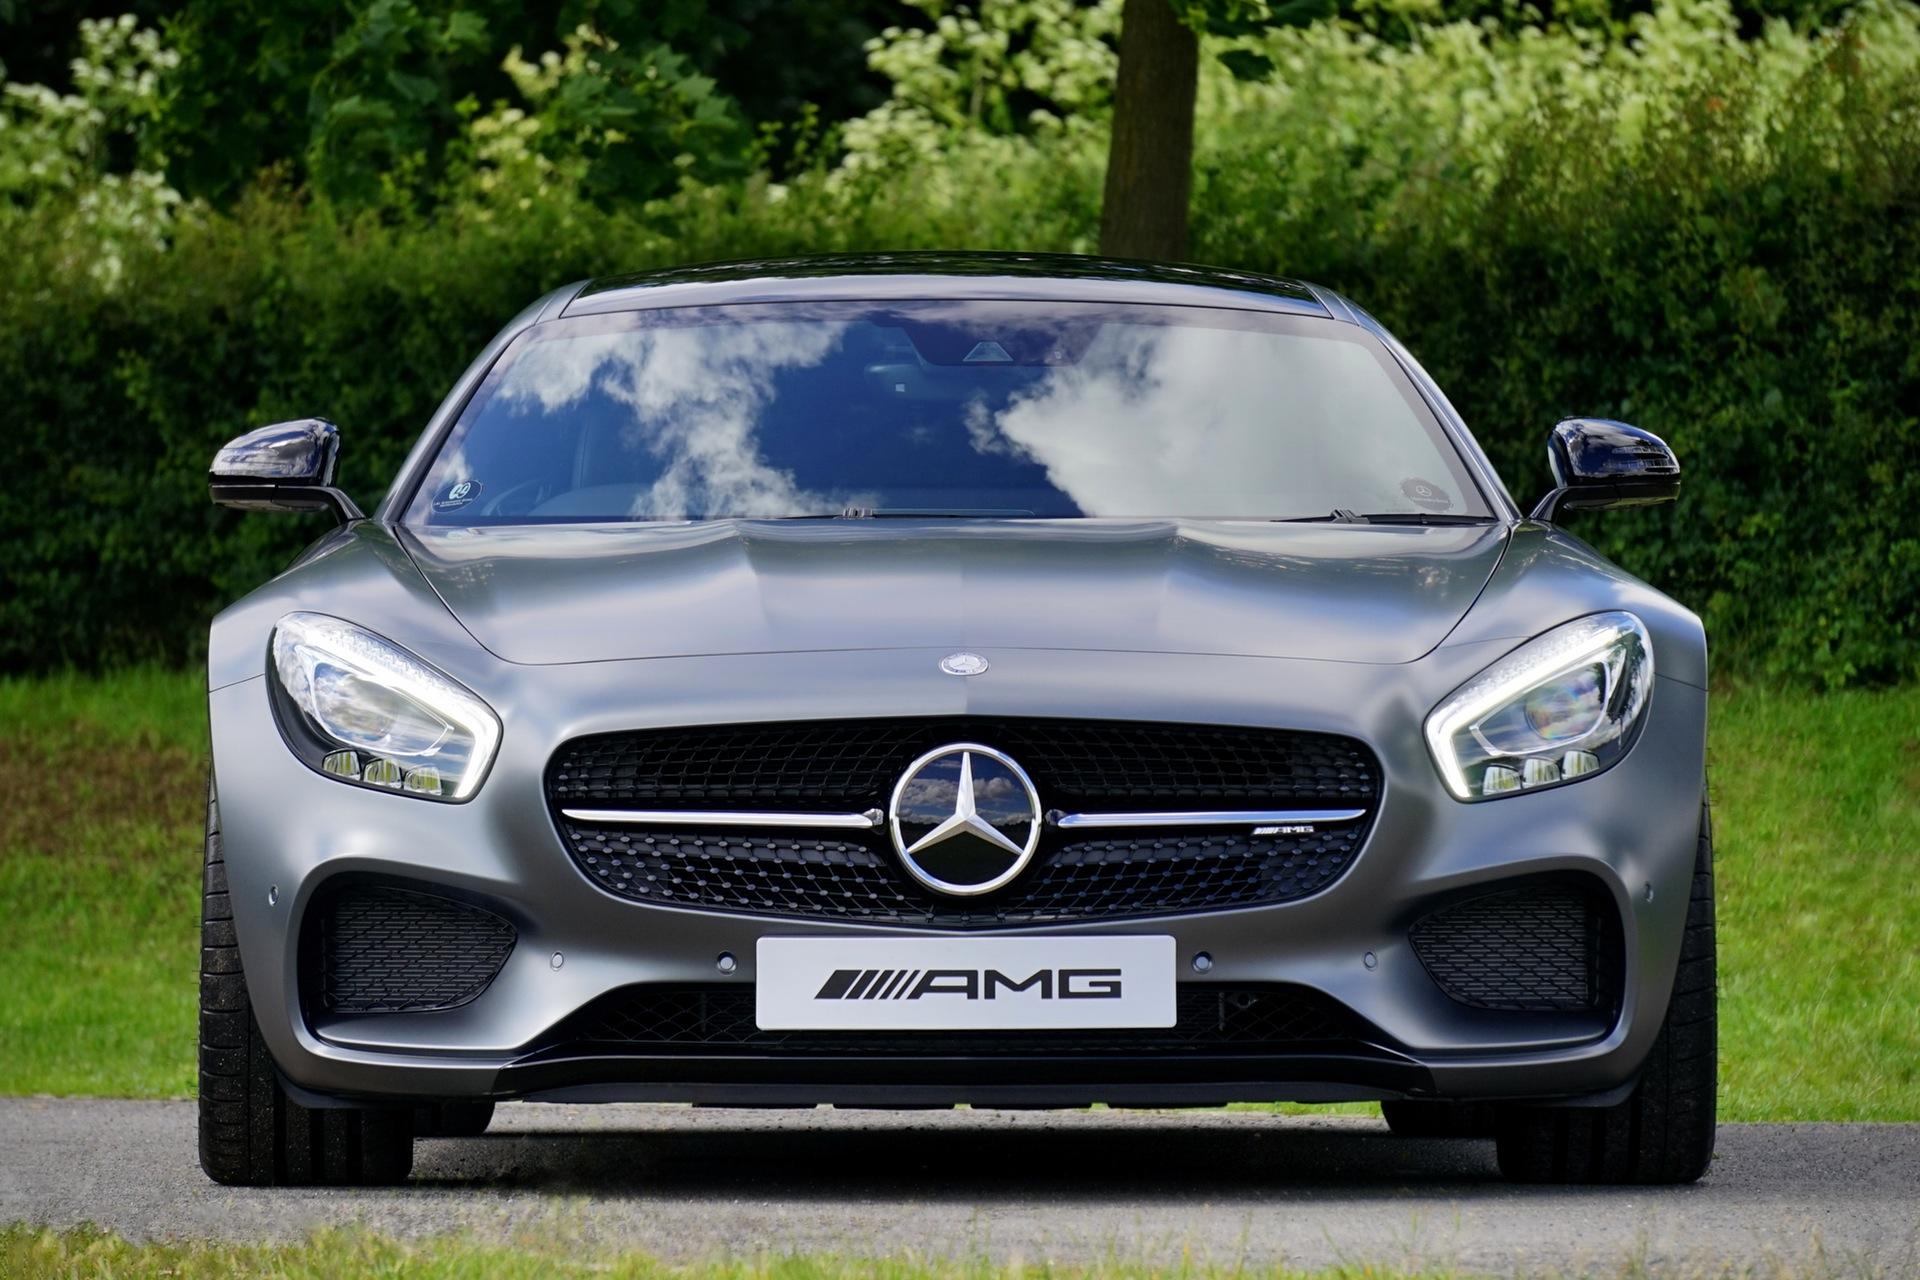 voiture, luxe, sport, Mercedes, Elite, Benz - Fonds d'écran HD - Professor-falken.com